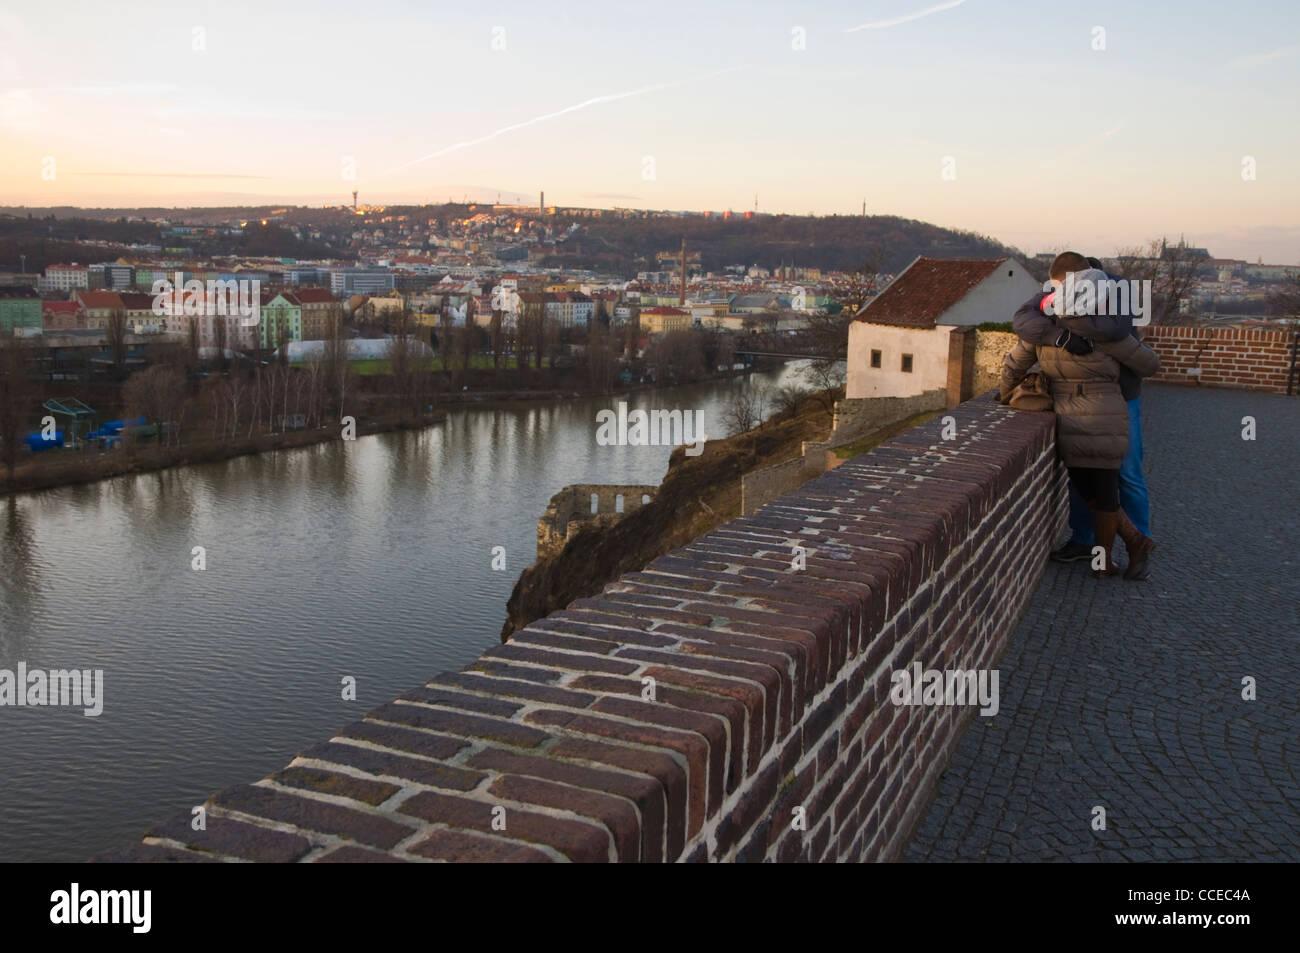 Couple at dusk on Vysehrad ramparts with Vltava riverside winter views Prague Czech Republic Europe - Stock Image